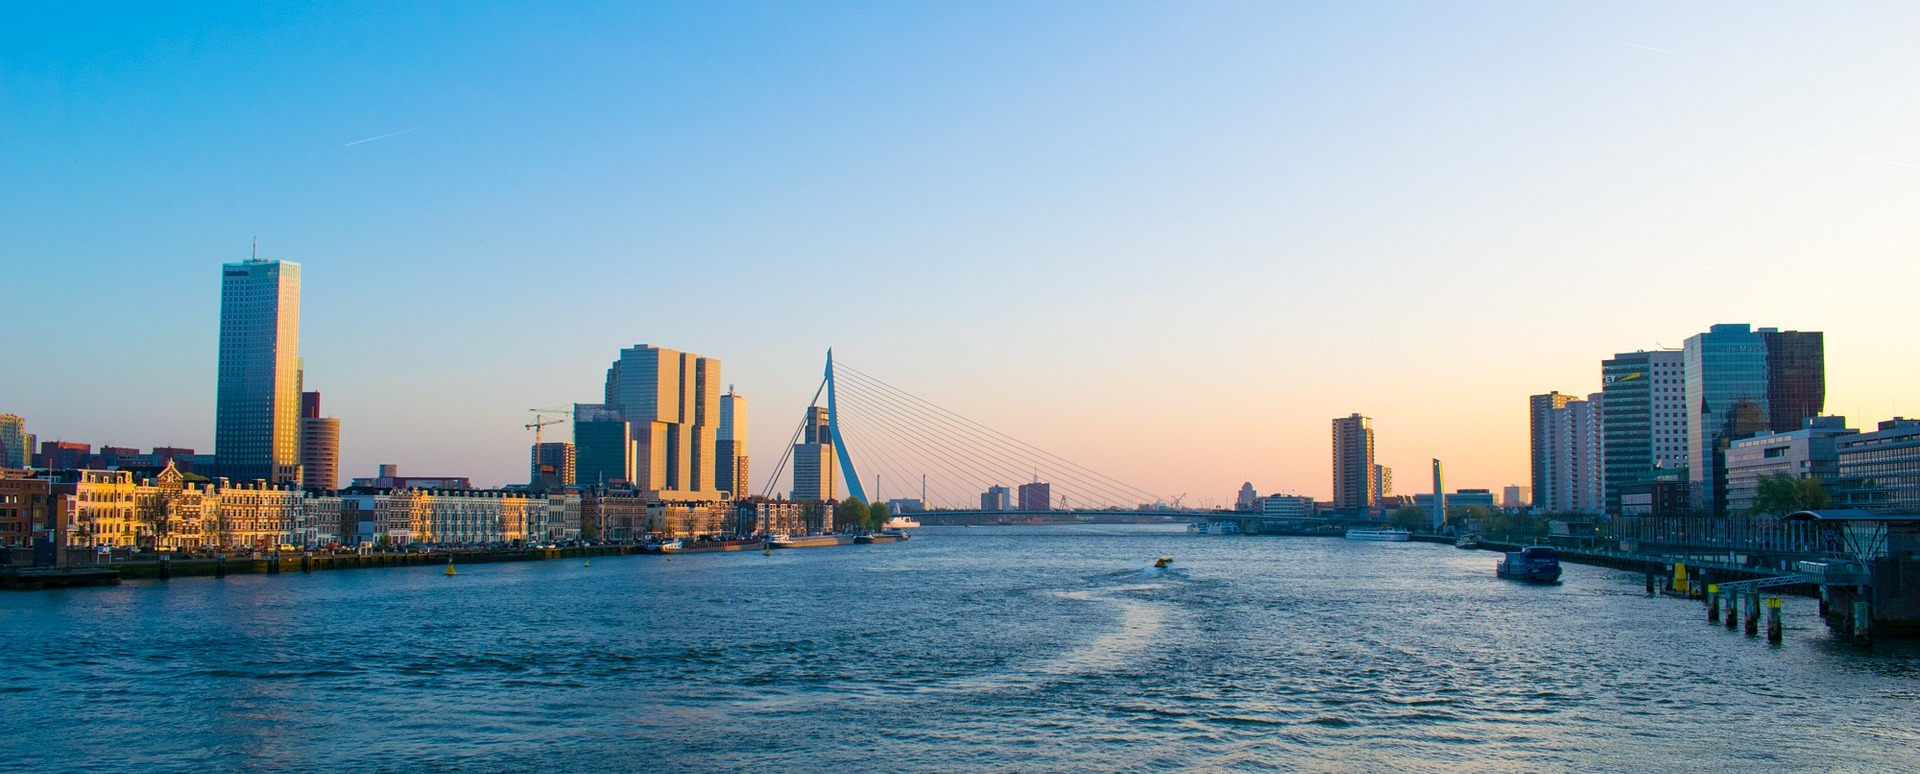 Snel Woning Verkopen in Rotterdam